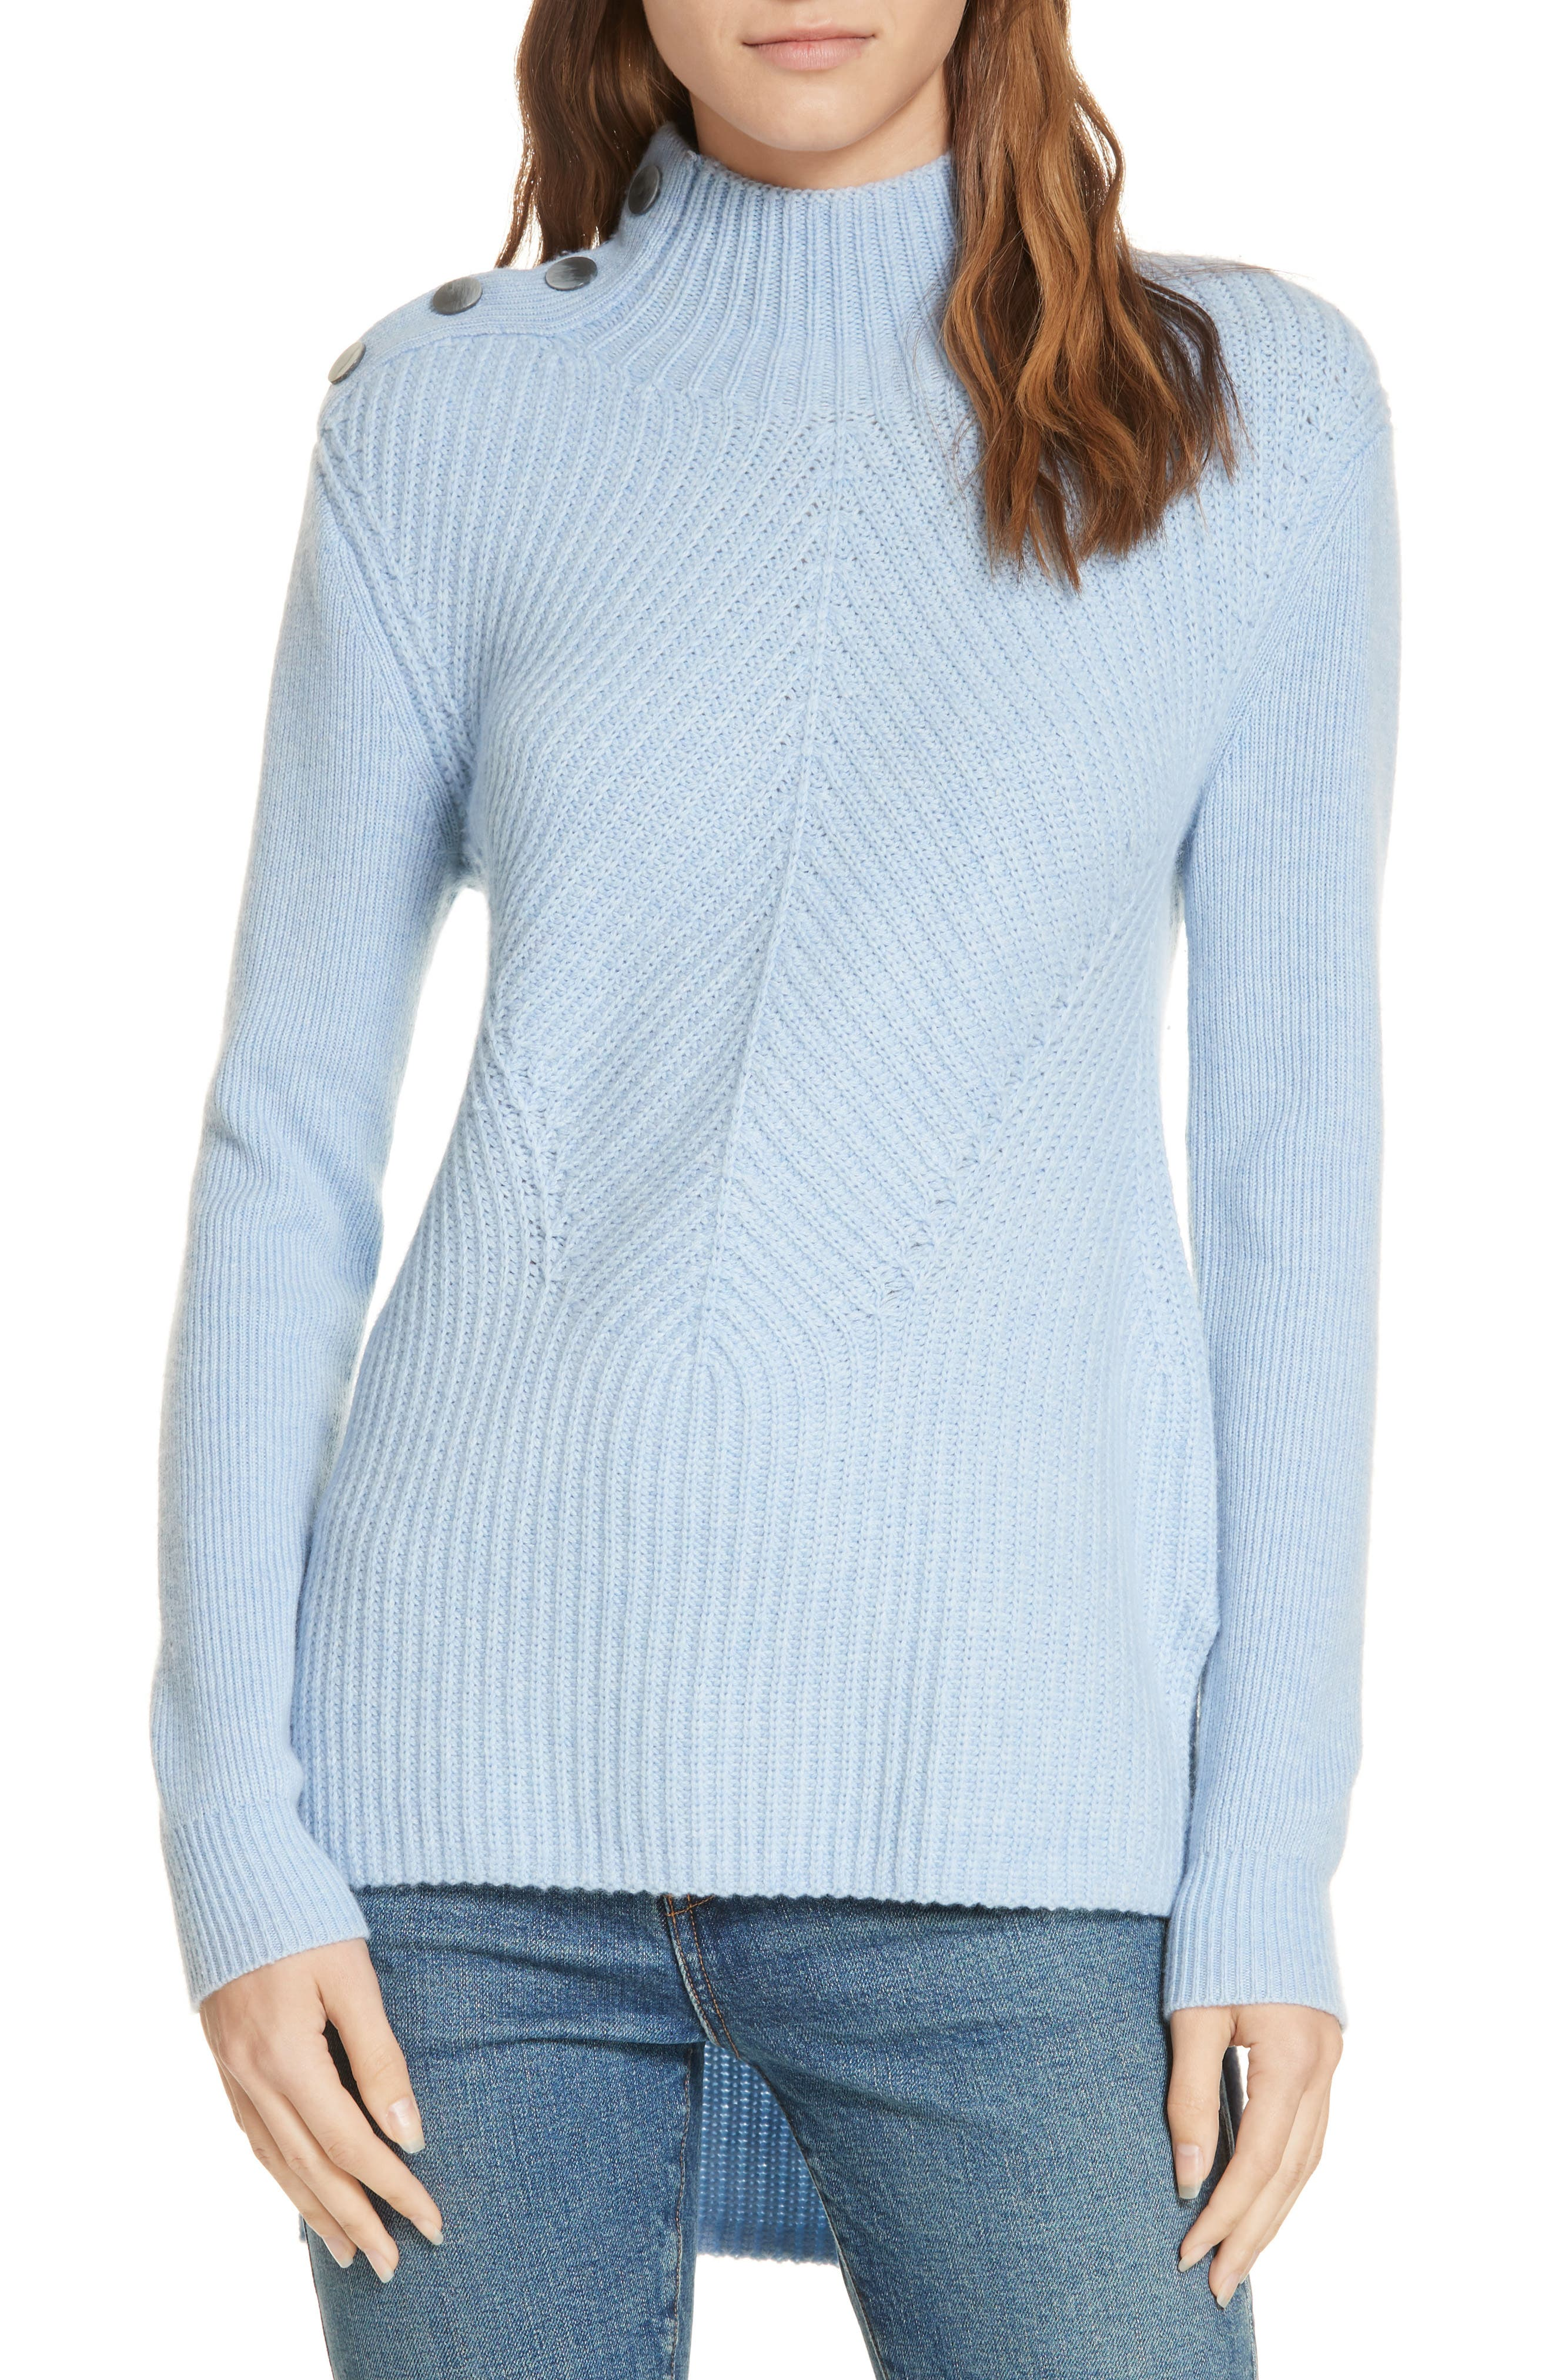 Veronica Beard Rama Merino Wool & Cashmere High/low Sweater, Blue